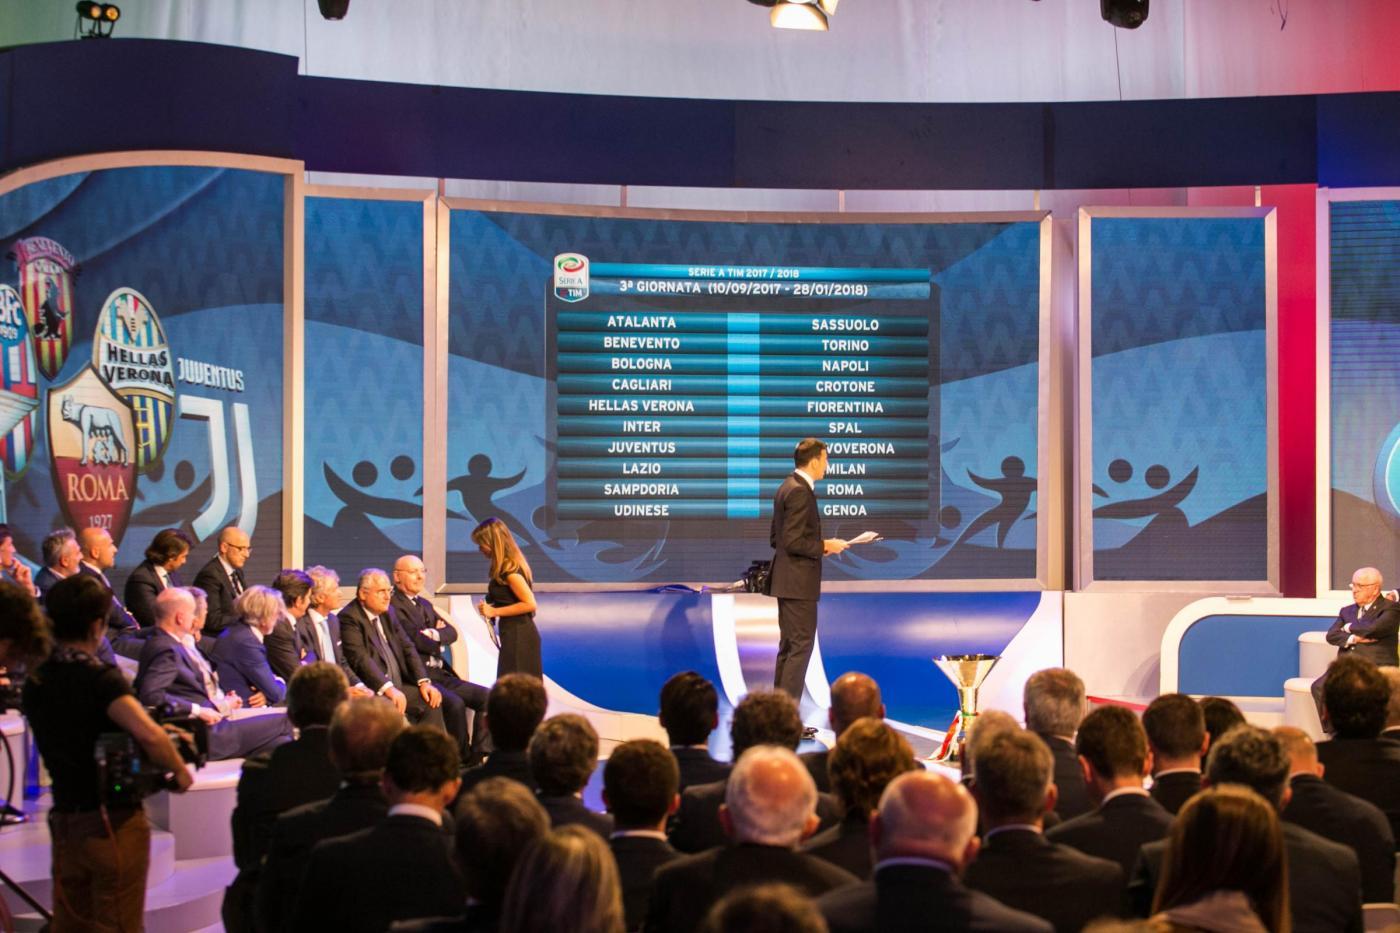 Estrazione Calendario Serie A.Sorteggio Calendario Serie A Data Orario Streaming E Criteri